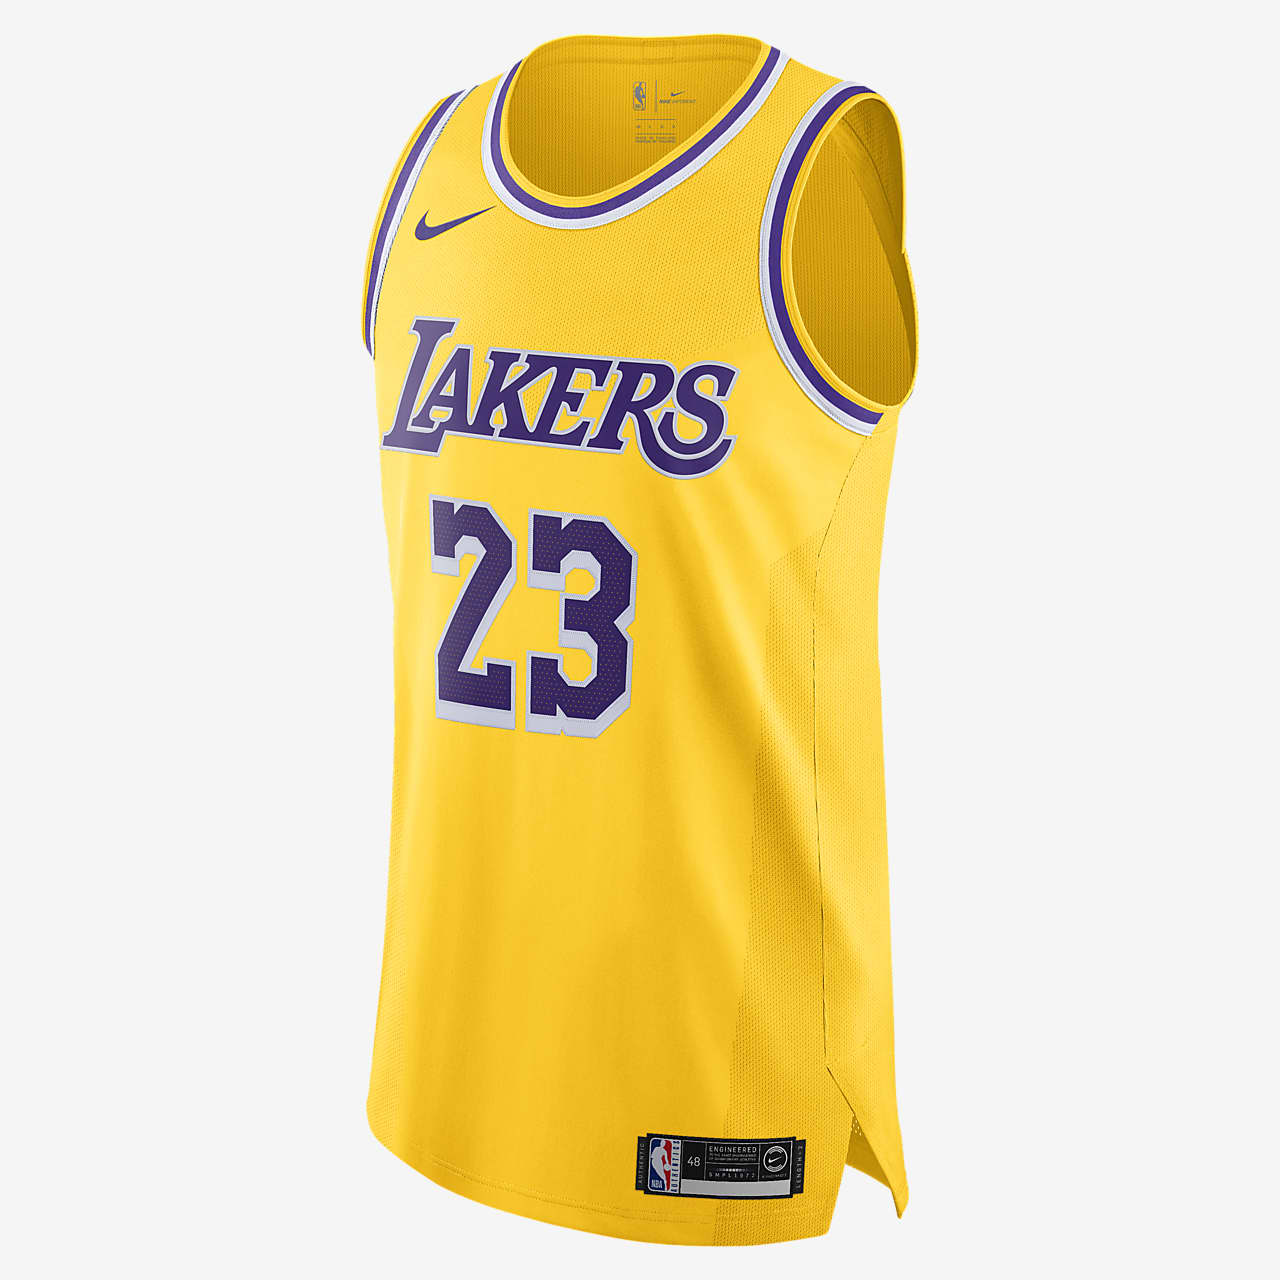 Idear Óptima evitar  Camiseta Nike NBA Authentic LeBron James Lakers Icon Edition. Nike.com